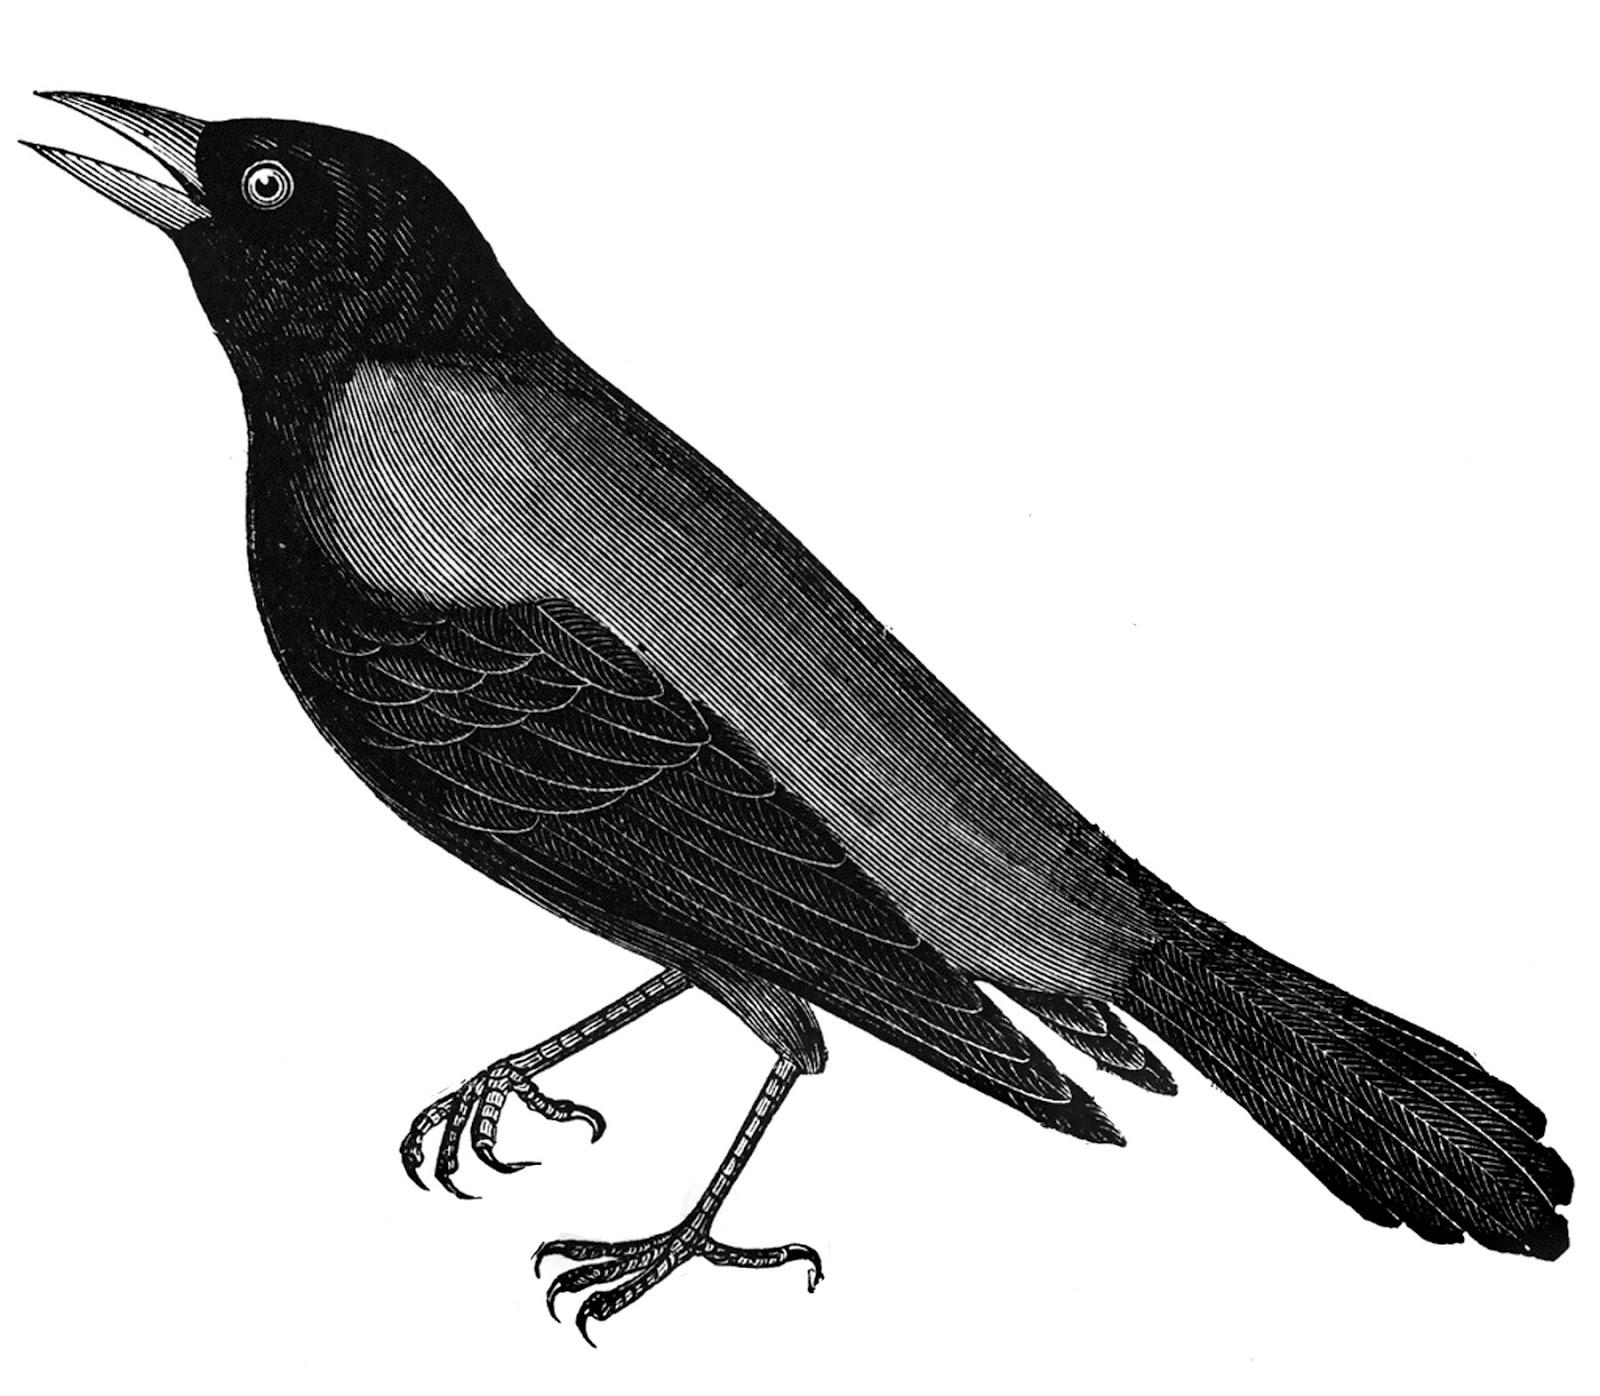 http://1.bp.blogspot.com/-2GQWWbiuz2A/UADHPQIdR6I/AAAAAAAAFoA/AP6_rOdwSfI/s1600/free+vintage+digital+stamp_black+crow.jpg